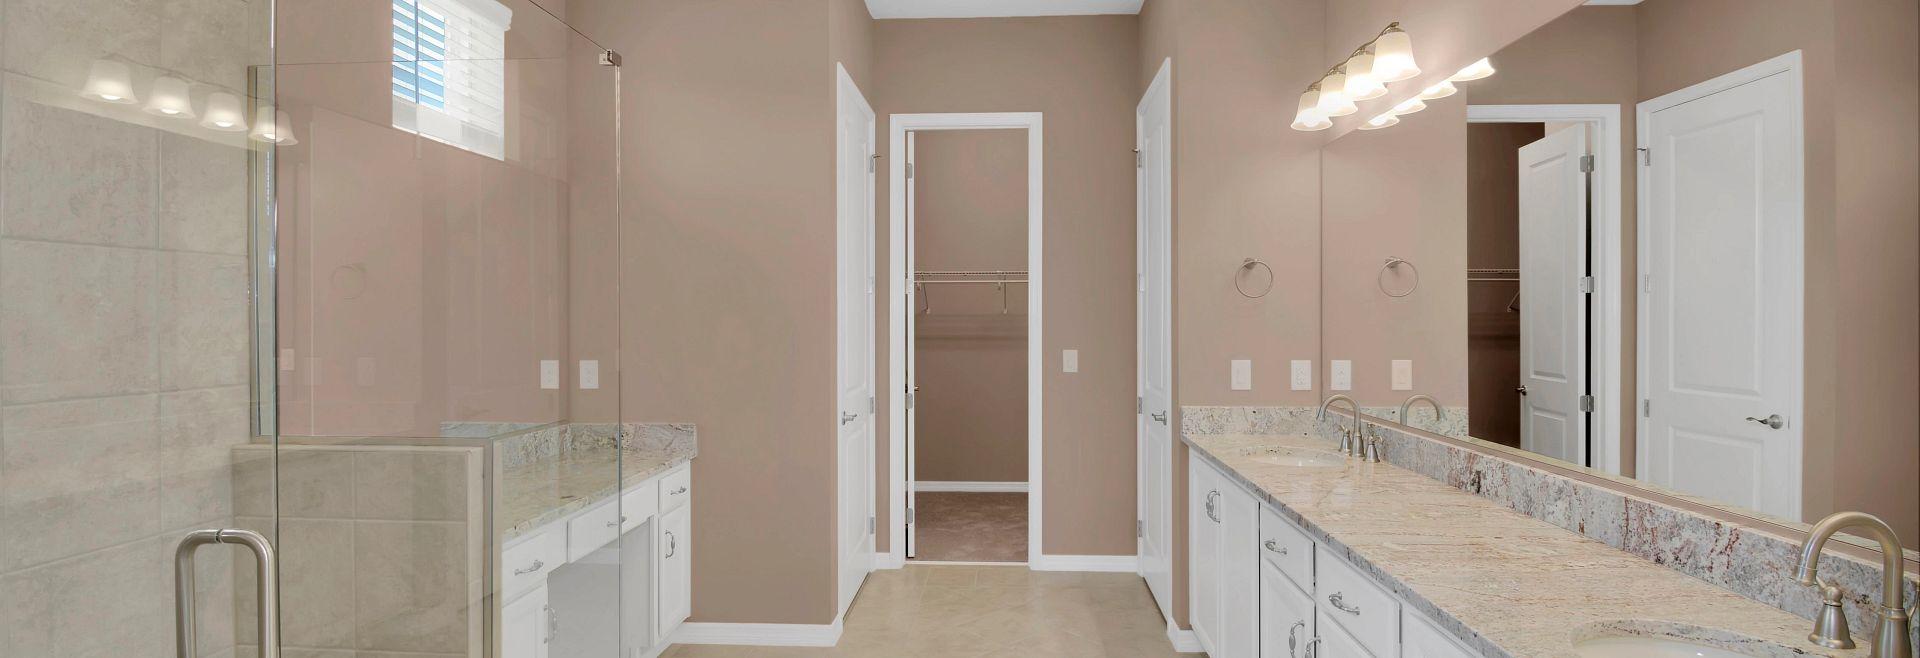 Trilogy at Ocala Preserve Quick Move In Home Imagine Plan Master Bath